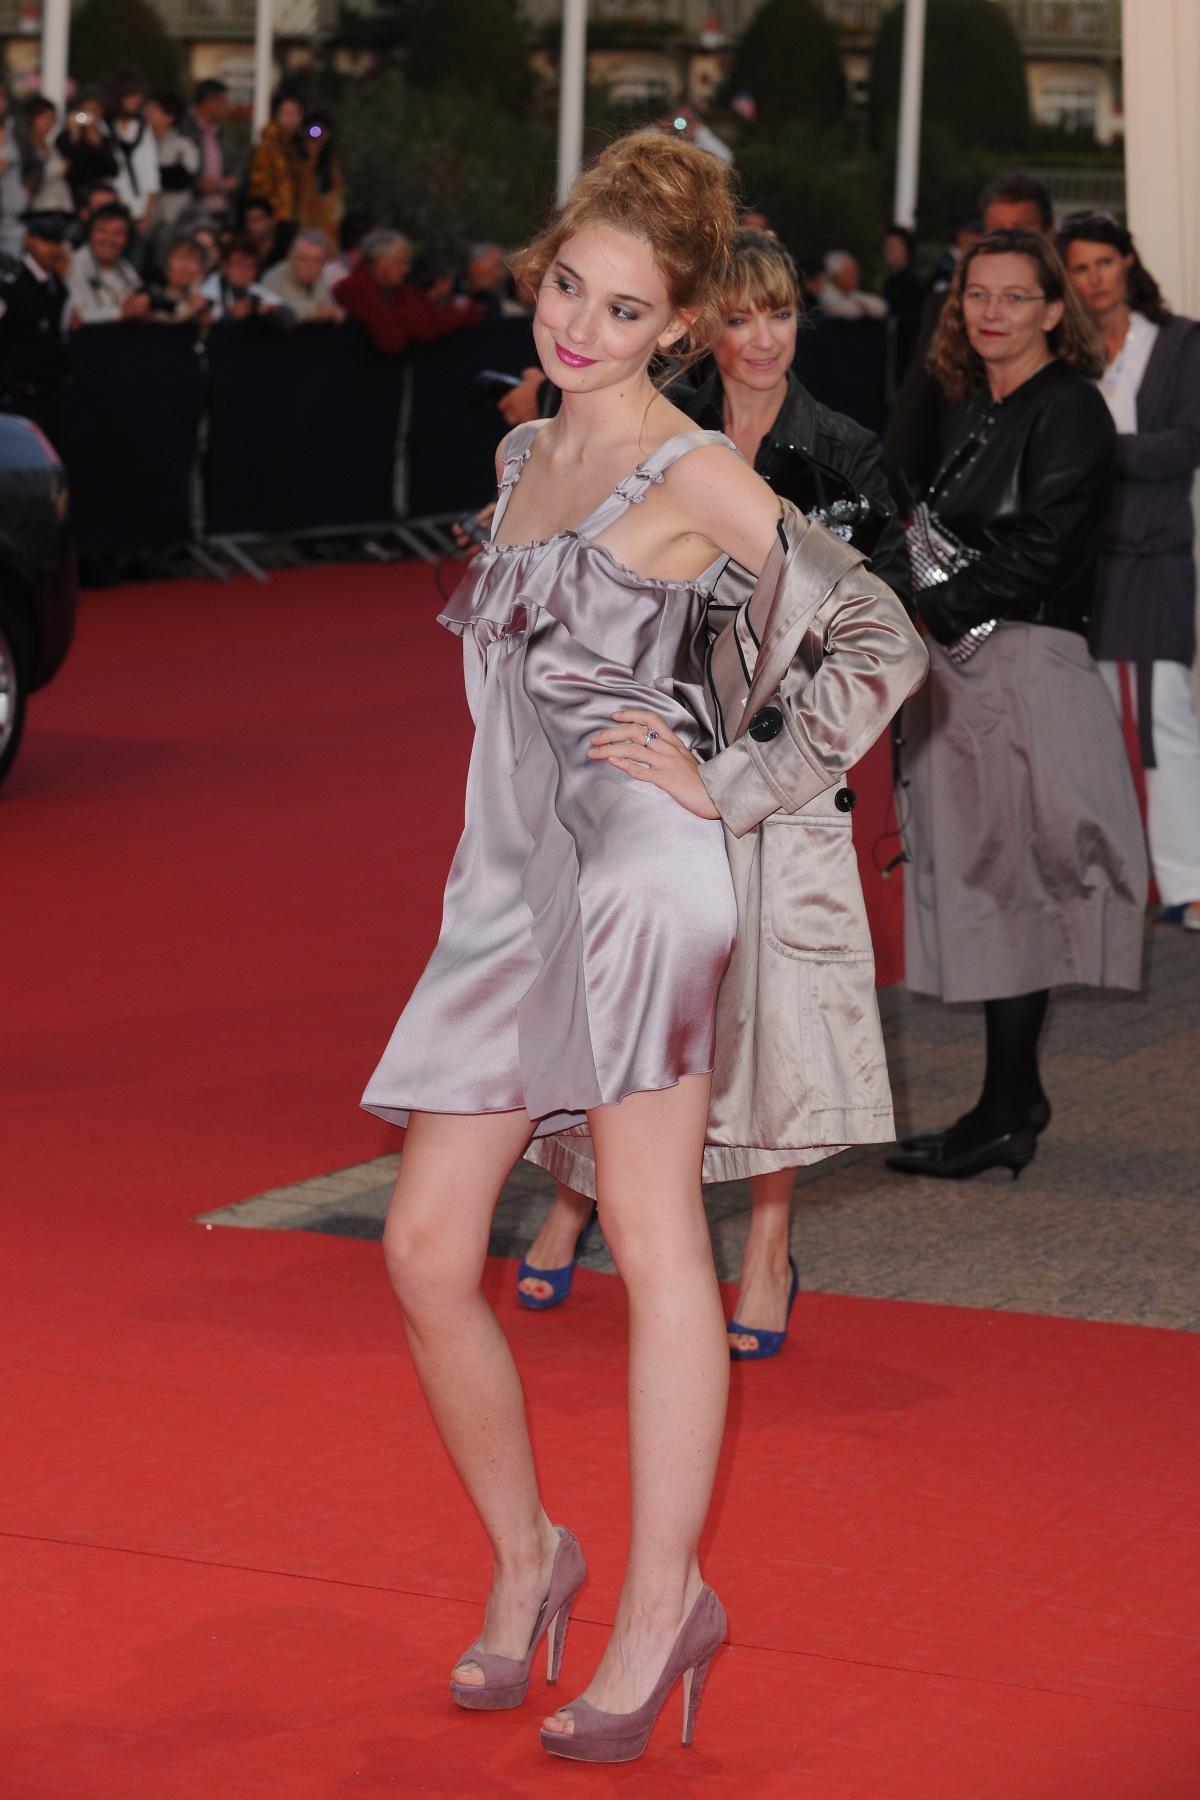 http://pics.wikifeet.com/D%C3%A9borah-Fran%C3%A7ois-Feet-541715.jpg